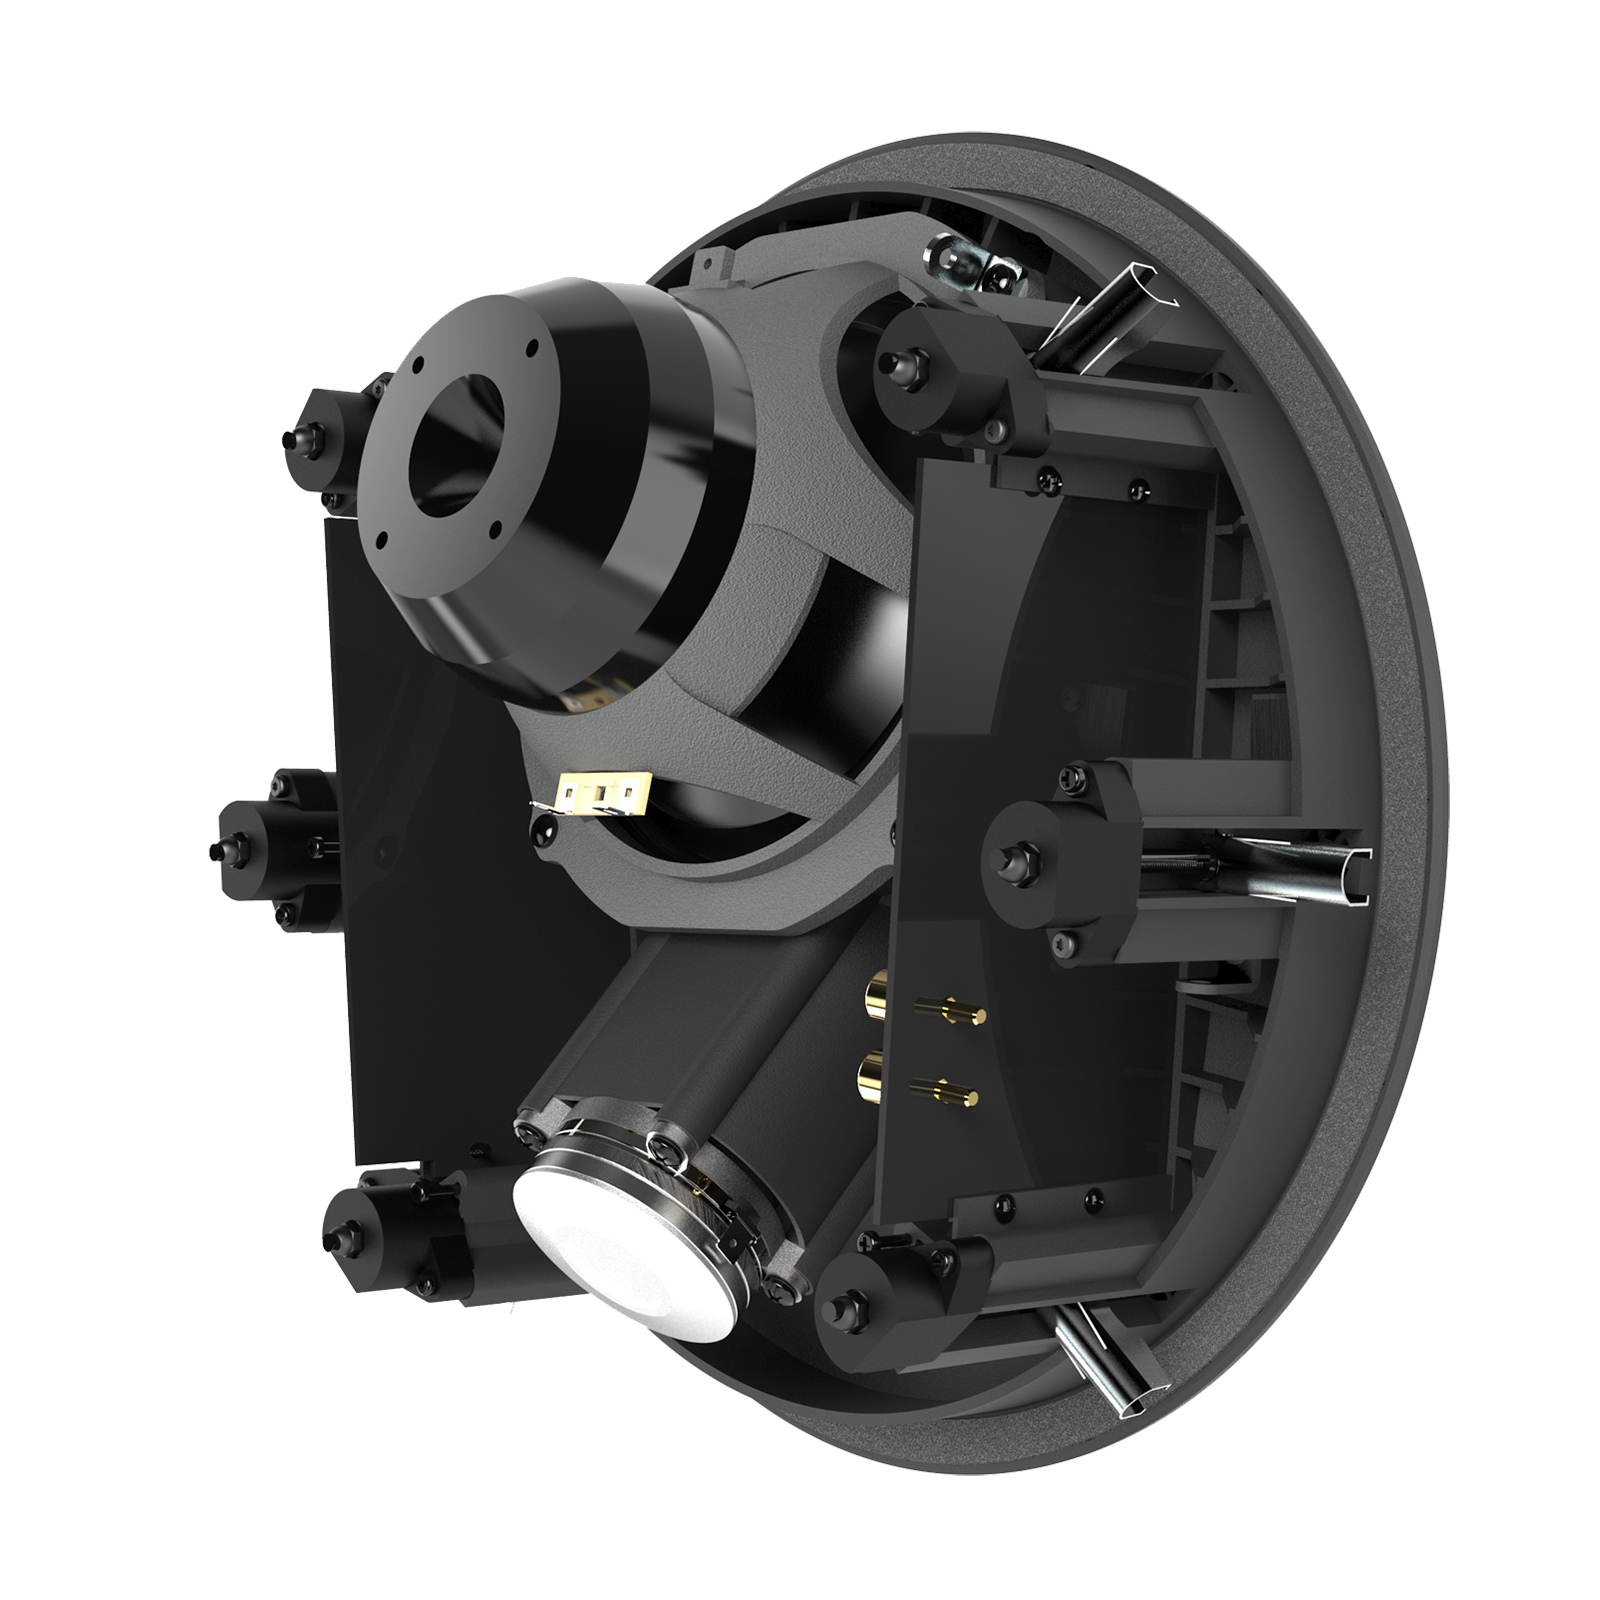 SCL-5 - Black - 2-Way 7-inch (180mm) In-Ceiling Loudspeaker - Back